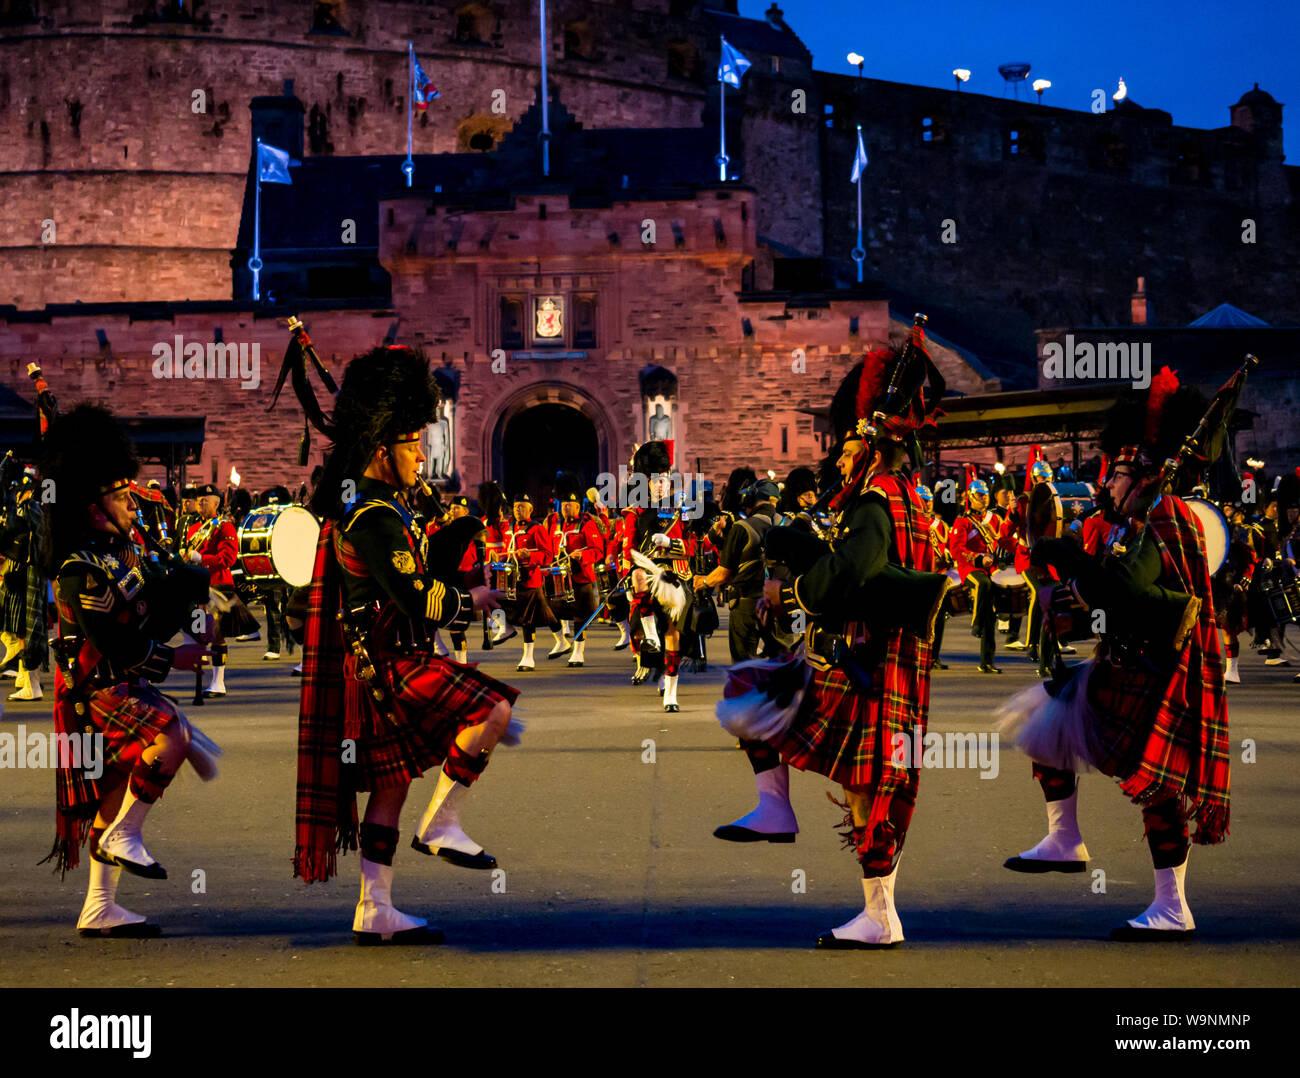 edinburgh-scotland-uk-14th-aug-2019-roya